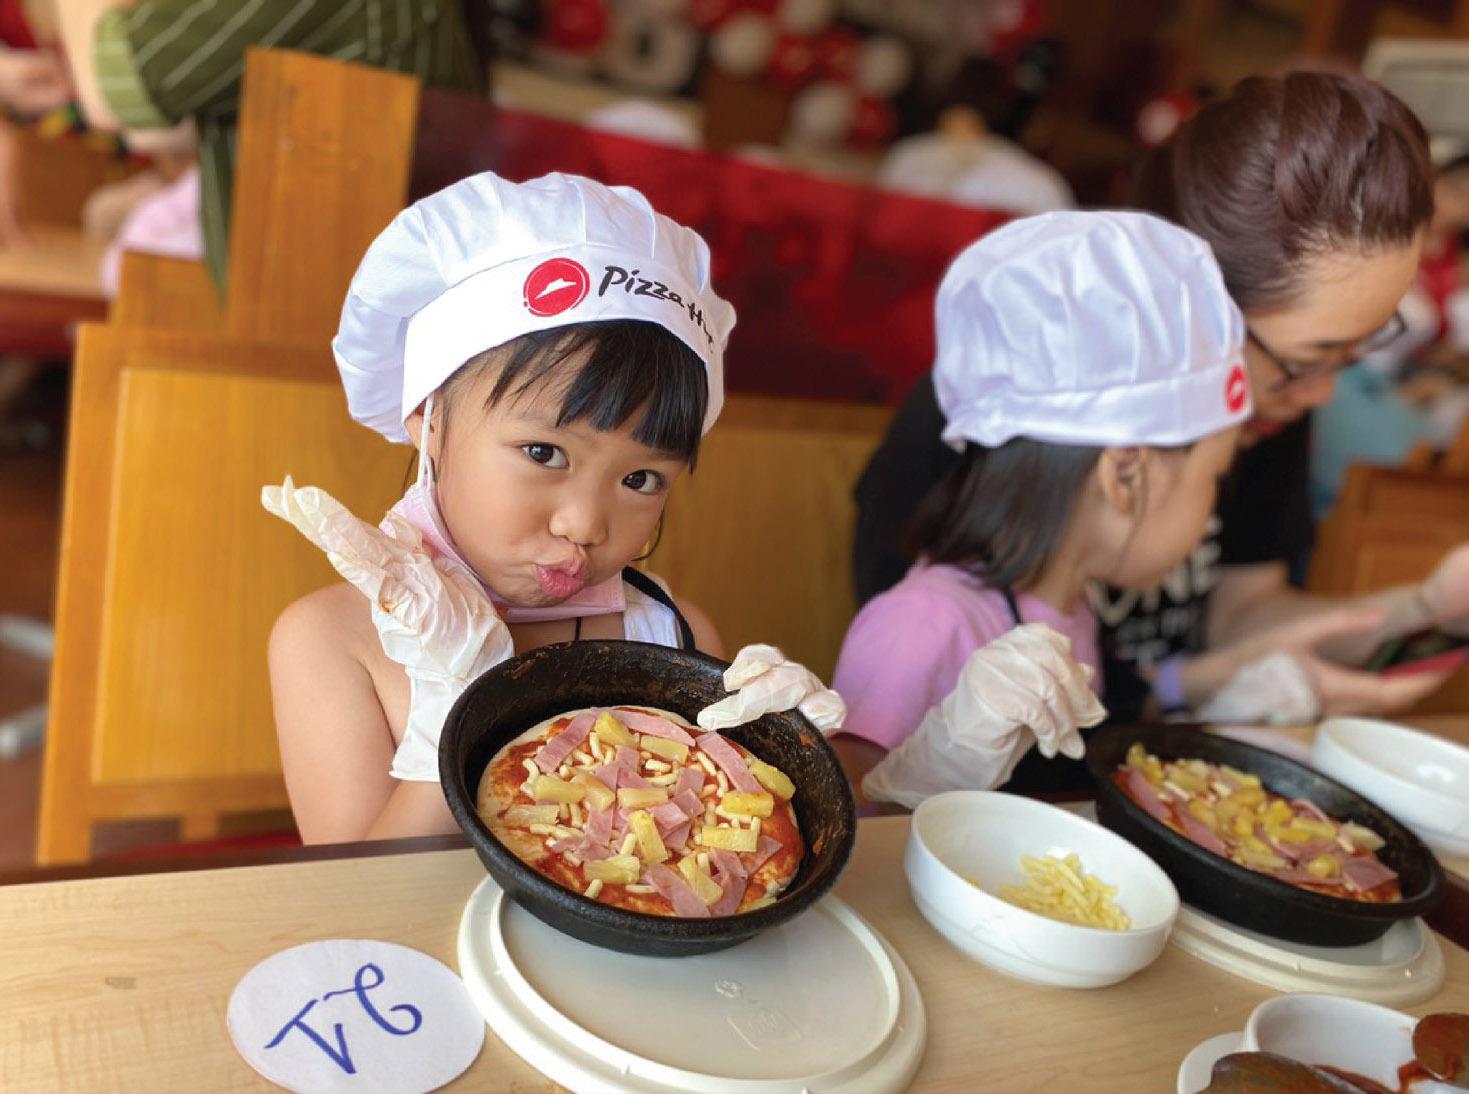 Aeon Mall pizza hut